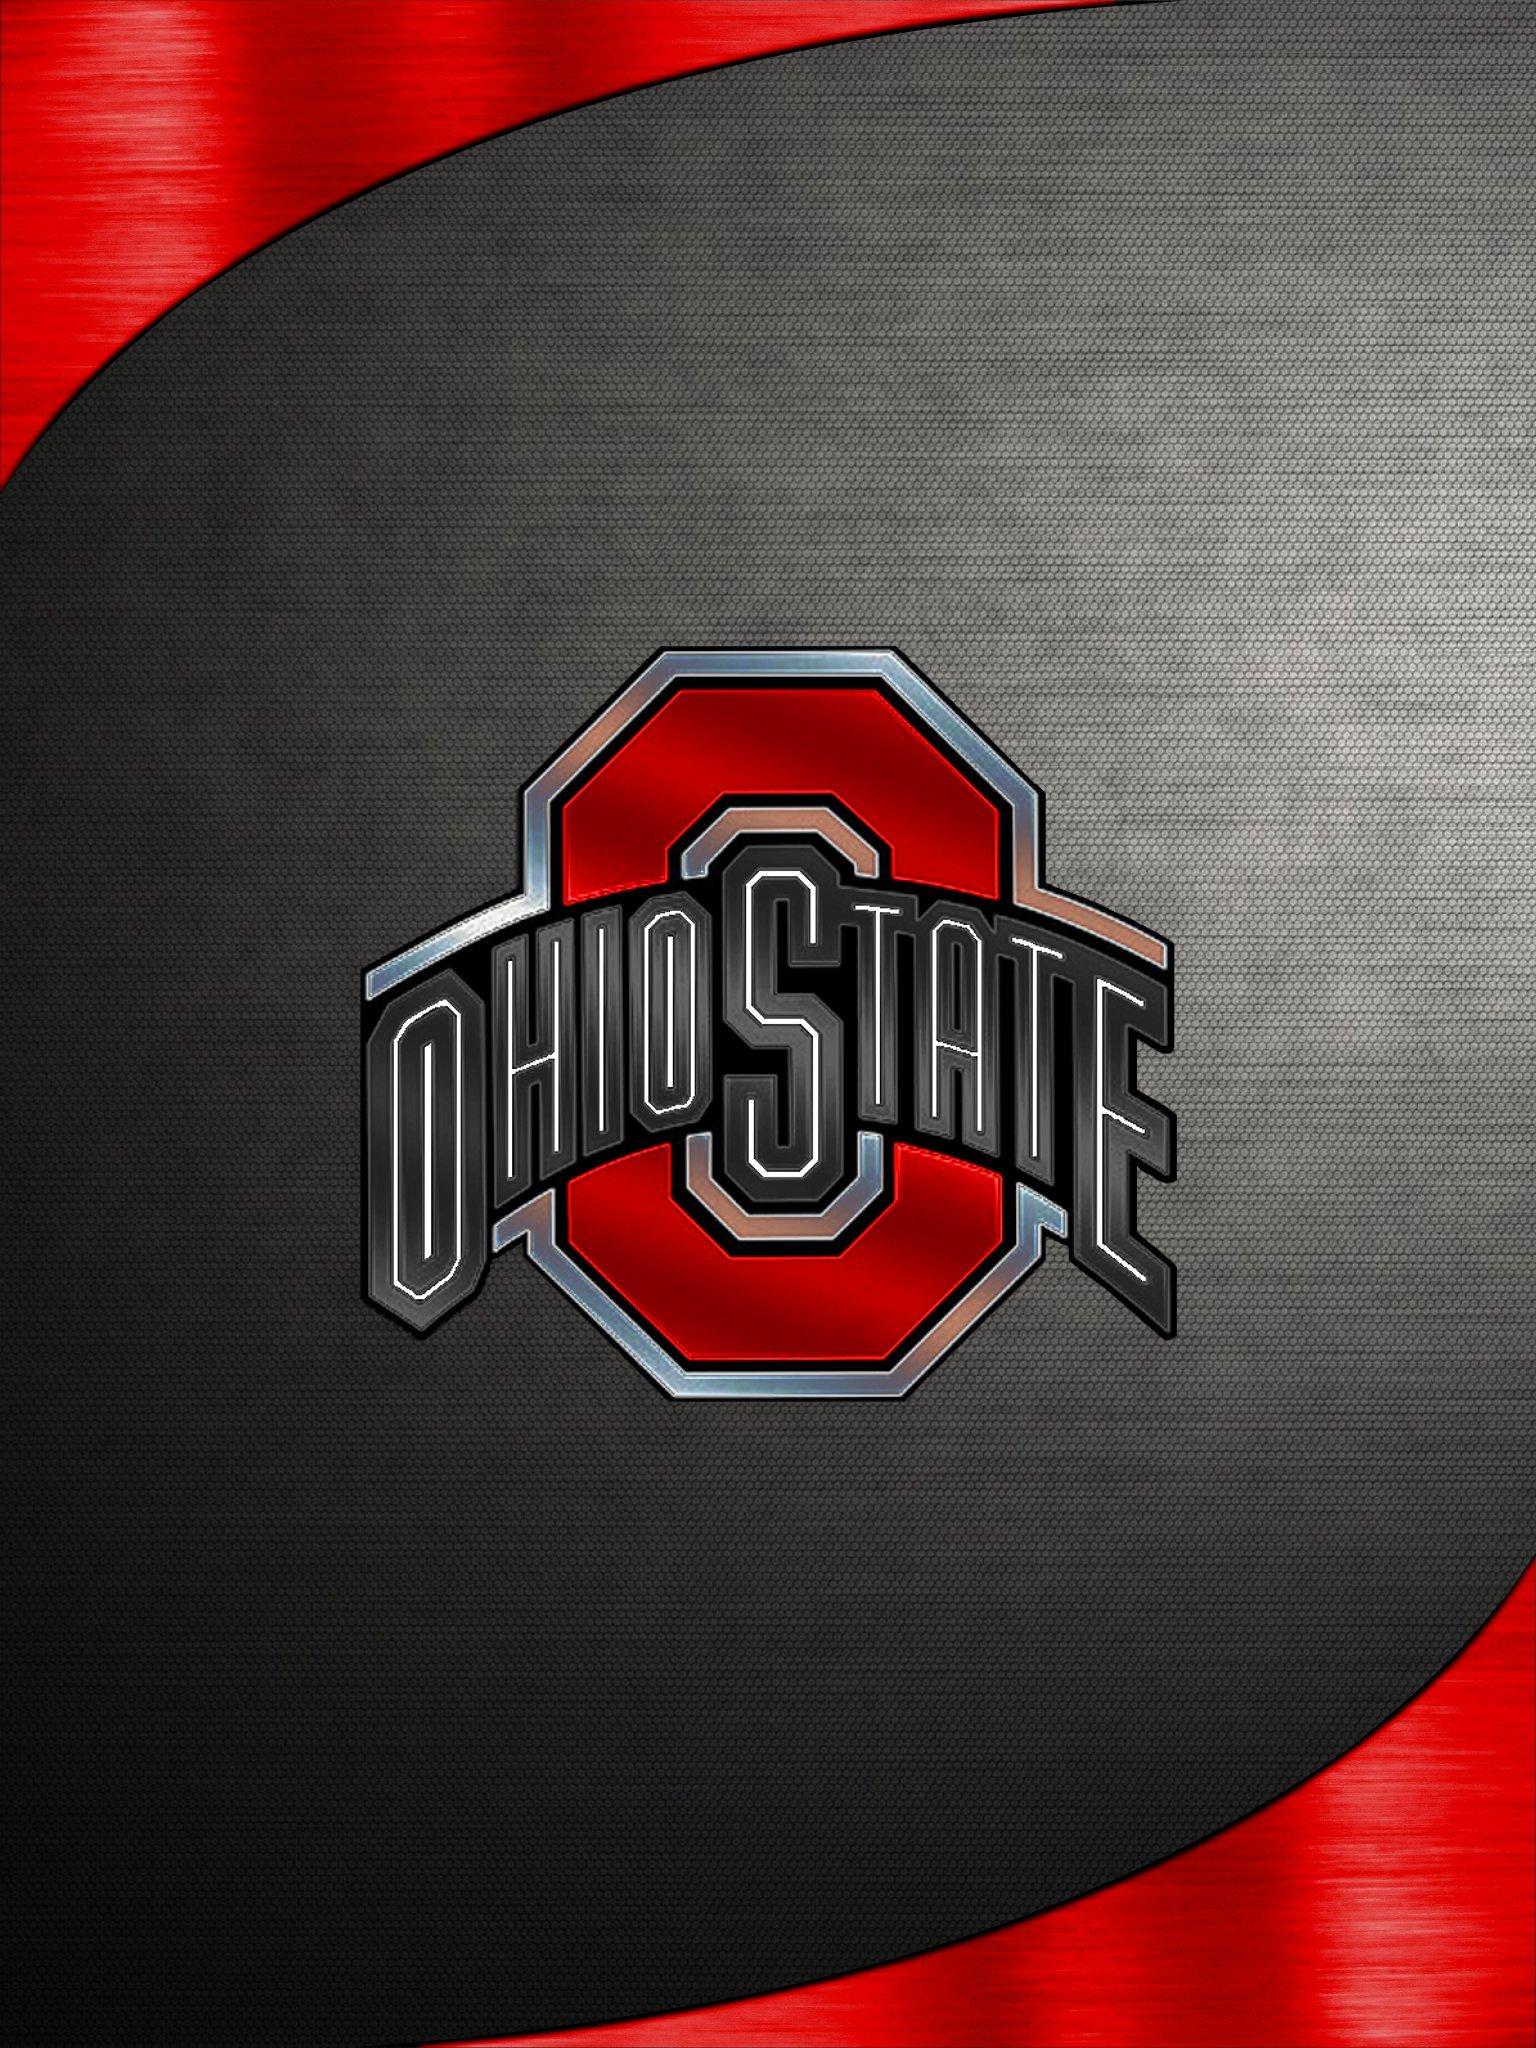 WallpaperSafari and Ohio on Wallpaper State Screensavers [50+]